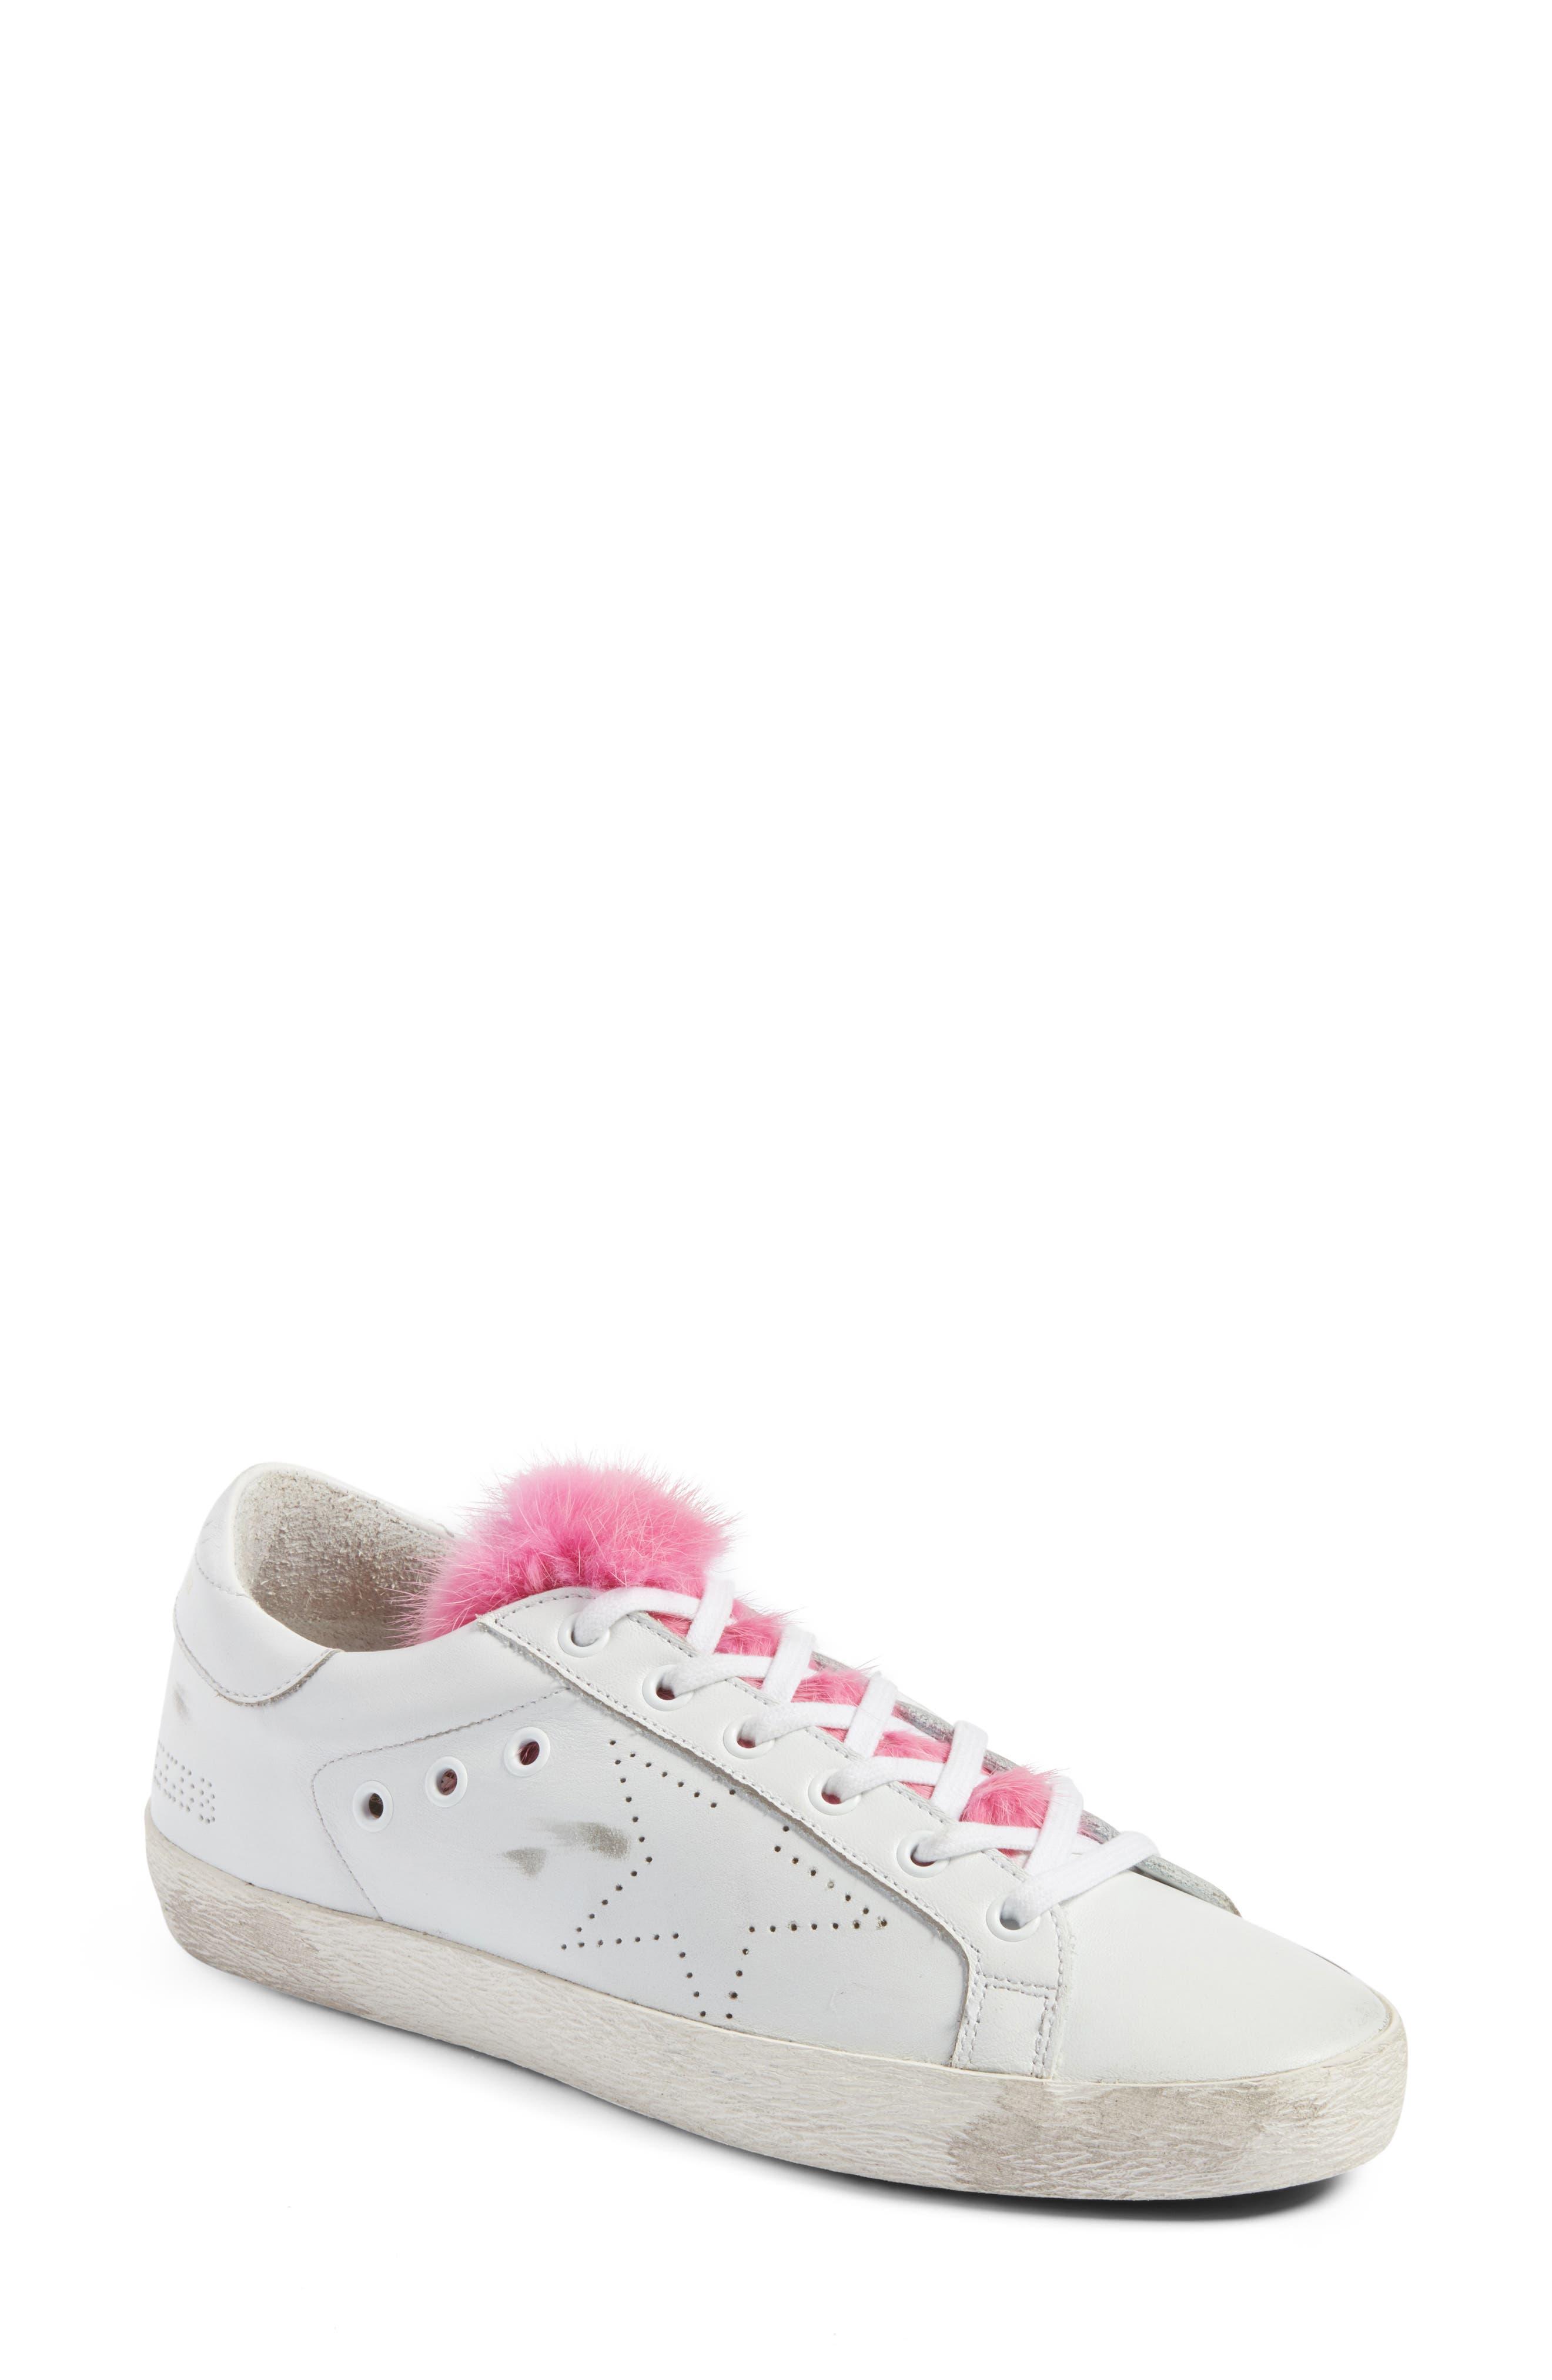 Superstar Genuine Mink Fur Sneaker,                             Main thumbnail 1, color,                             100